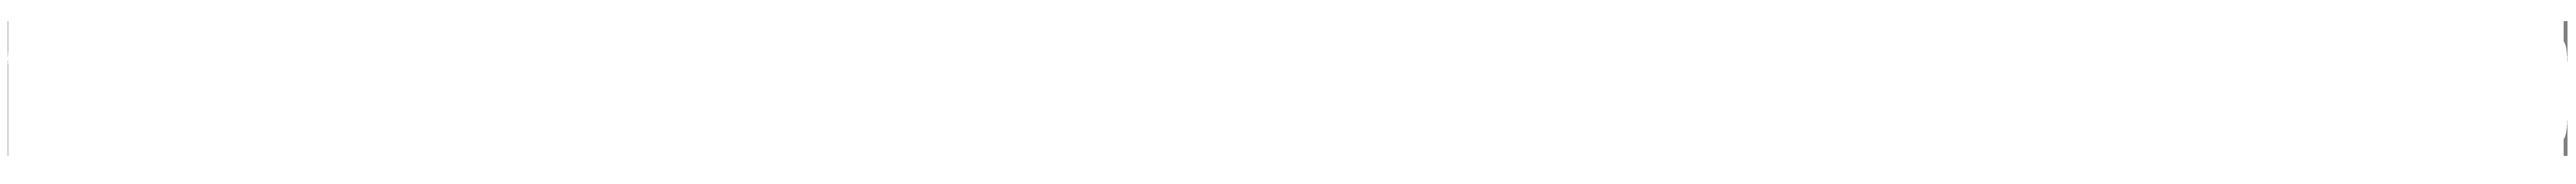 SCAC UNINCORPORATED